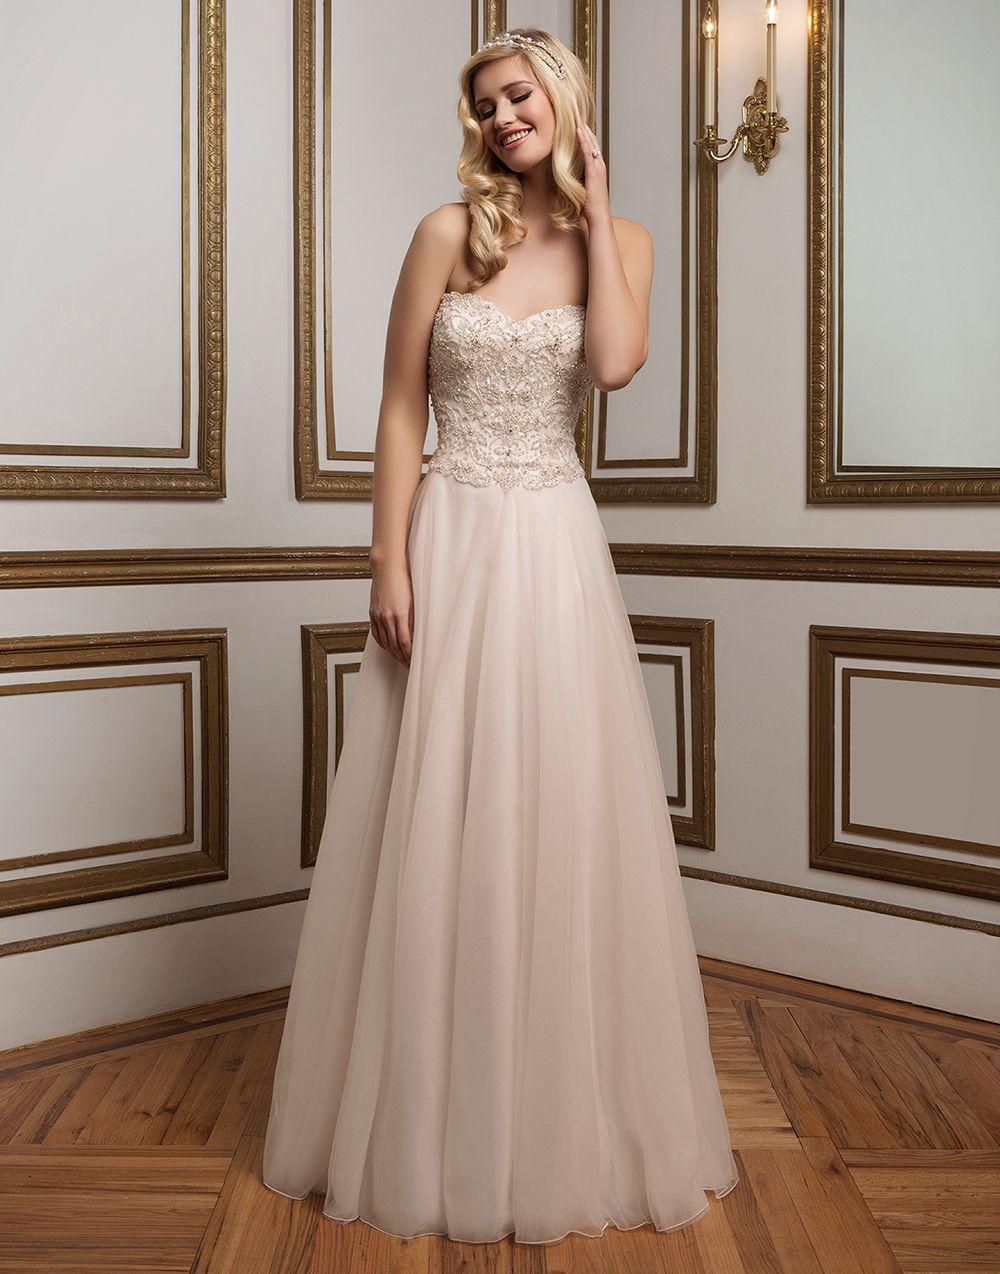 Justin Alexander wedding dresses style 8836 This sweetheart neckline ...